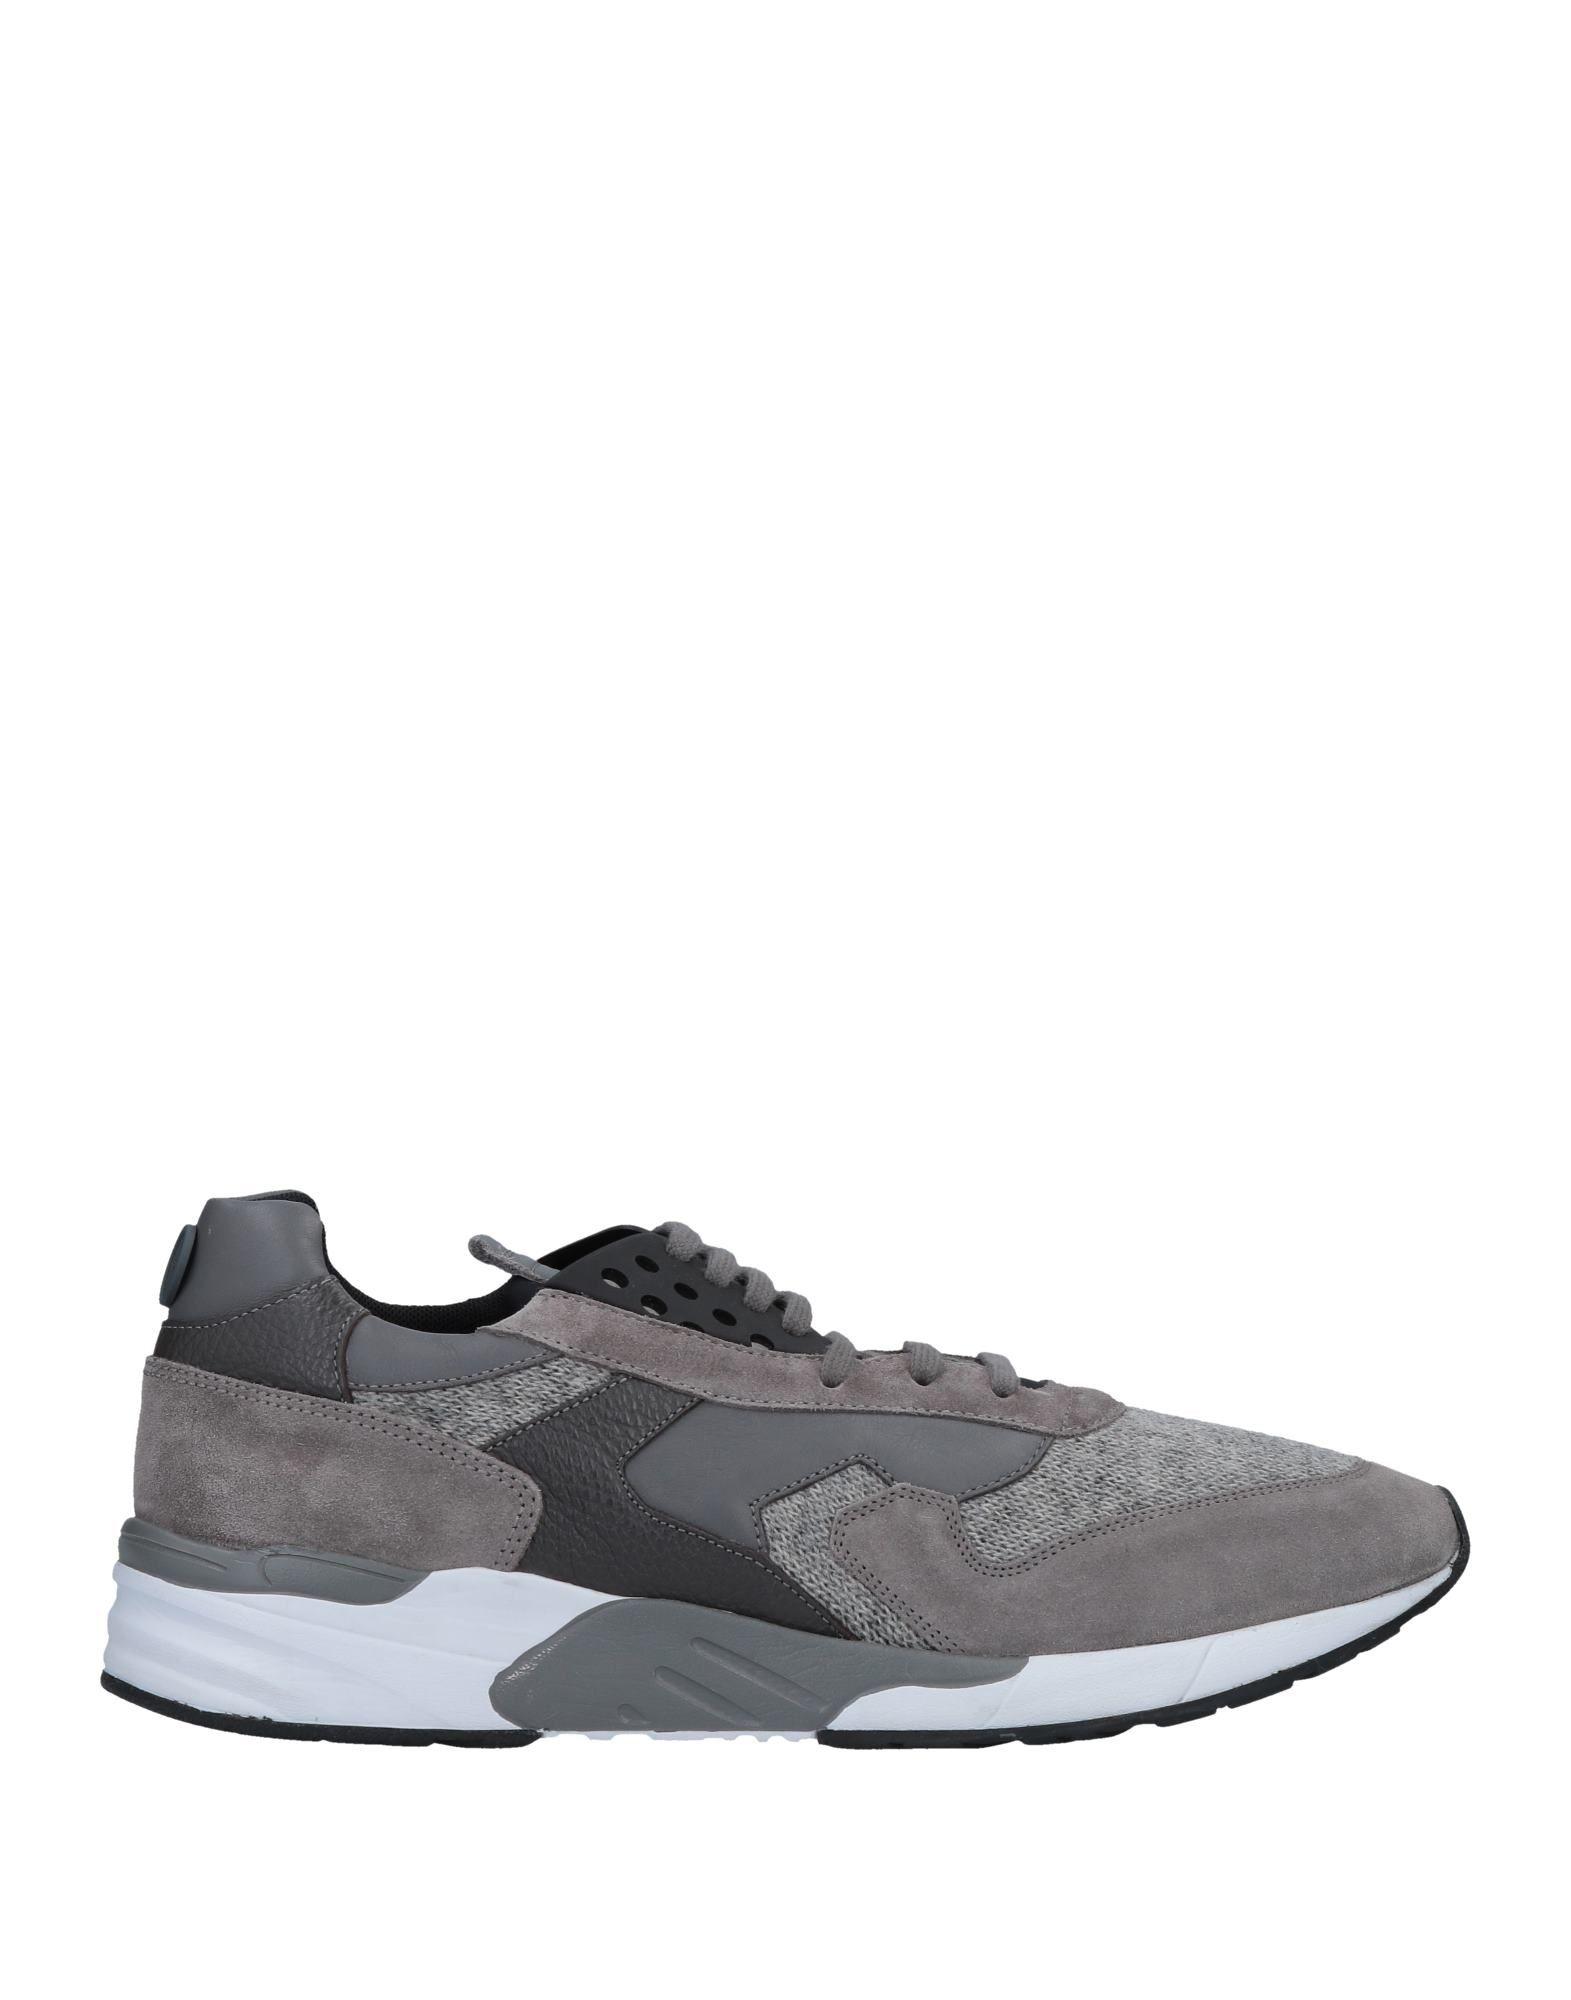 Sneakers - Mariano Di Vaio Uomo - Sneakers 11507376XR 9bc1ca